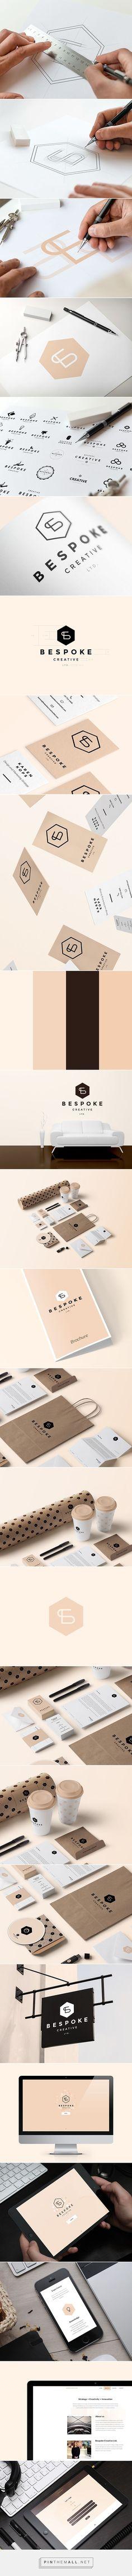 Bespoke Creative Ltd. - Branding & Website on Behance... - a grouped images picture - Pin Them All http://jrstudioweb.com/diseno-grafico/diseno-de-logotipos/